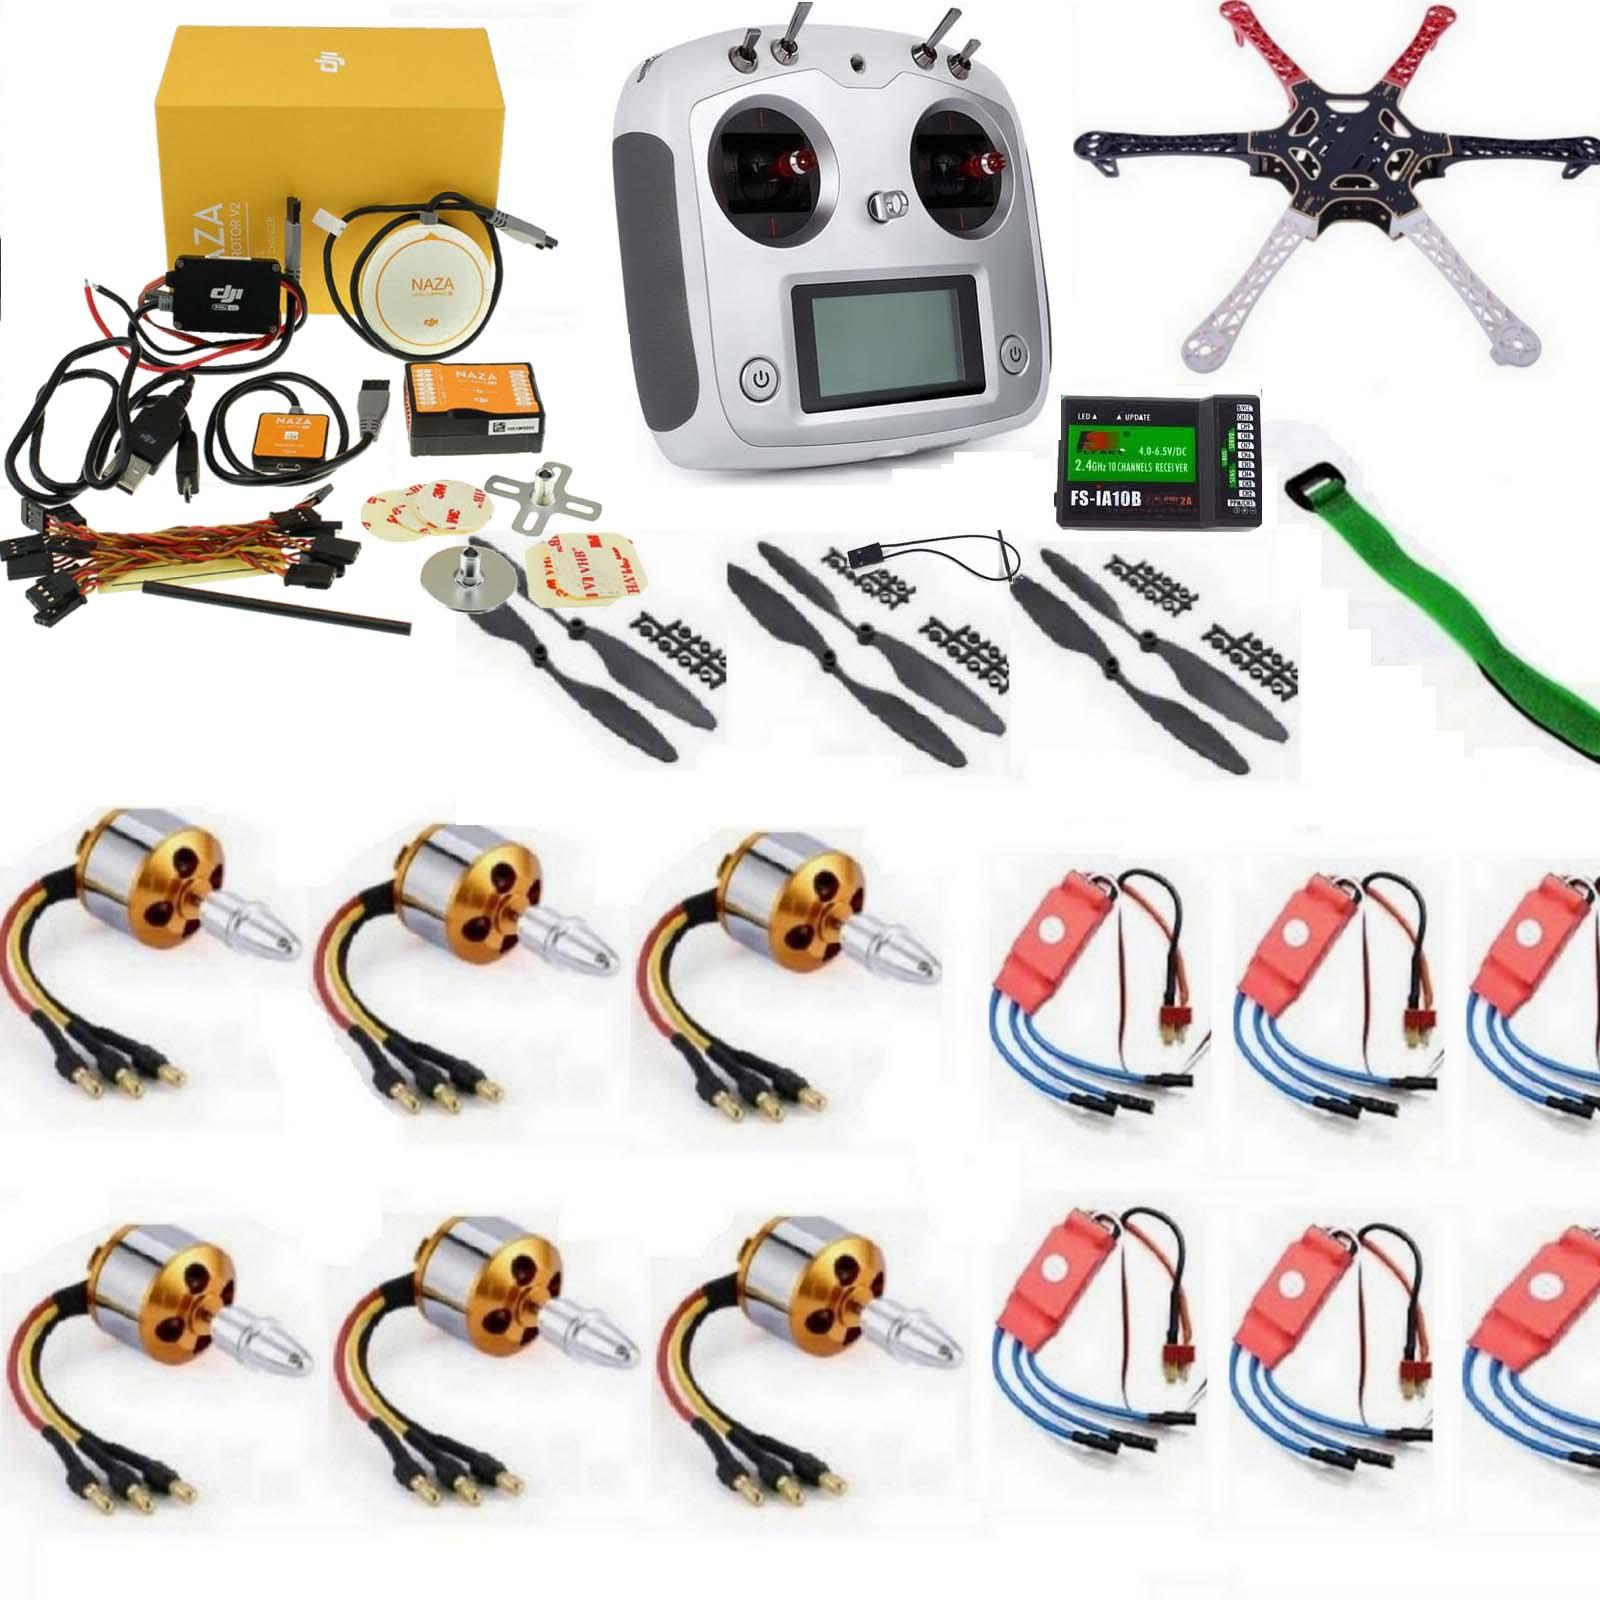 Hexacopter Drone Combo with DJI NAZA V2 and 10ch FlySky FS-I6S (Motor + ESC + Propeller + Flight Controller + Frame + TX-RX Flysky FSi6+ Power module + Belt) - Multirotor